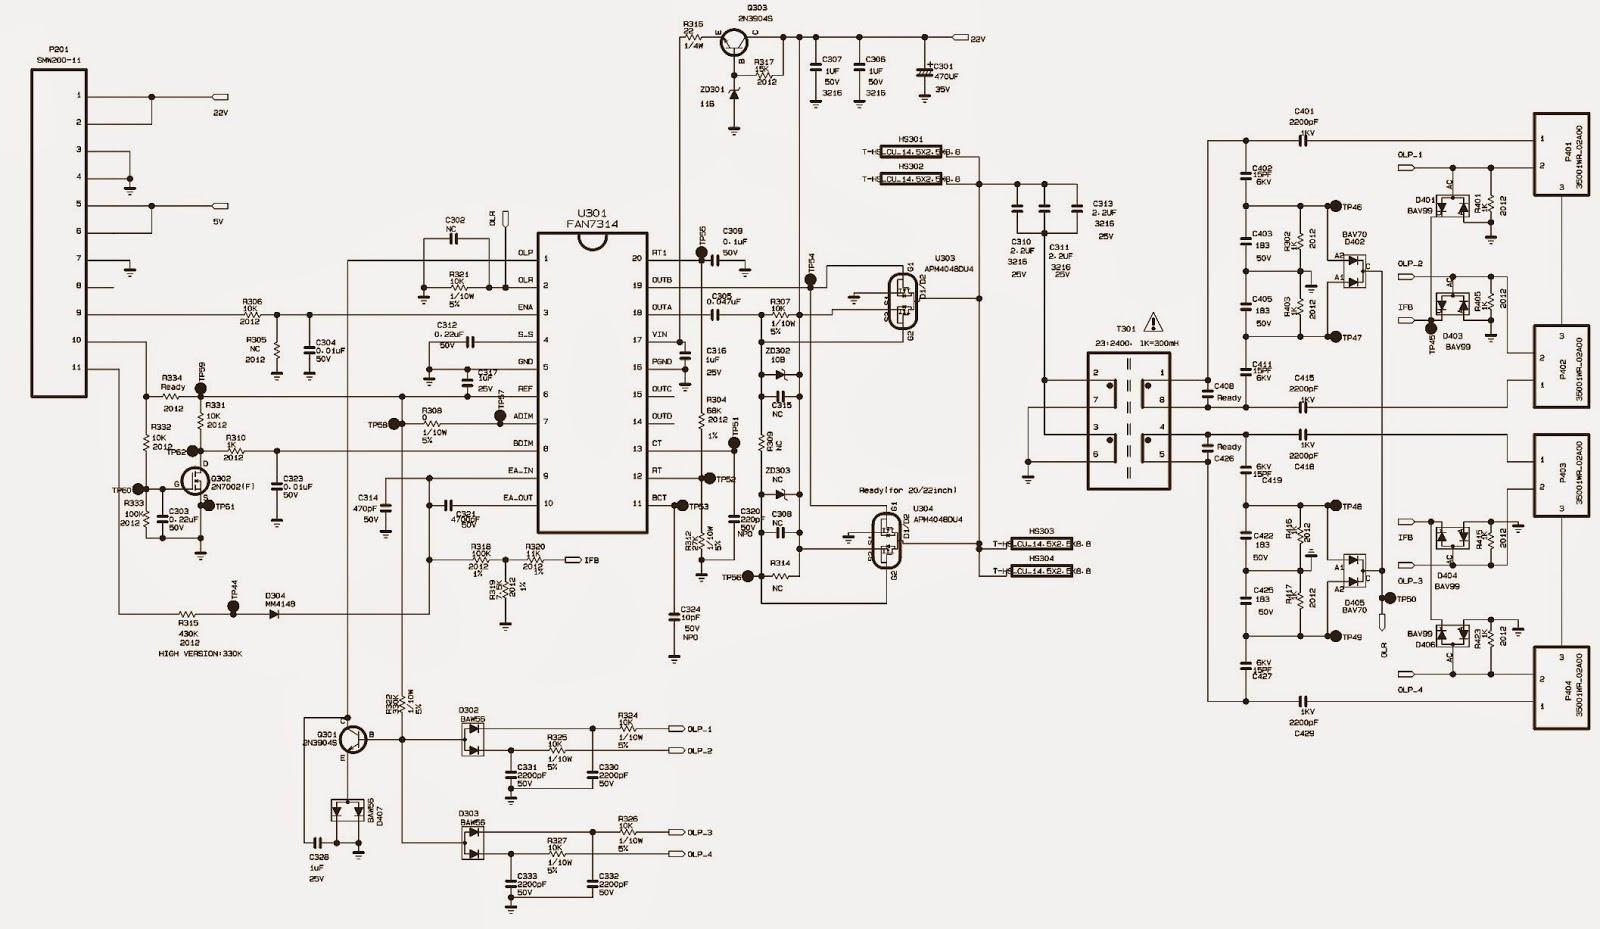 medium resolution of lg fridge wiring diagrams gallery lg flatron w1942s lcd monitor u2013 aocl32w831 u2013 philco28t35dg